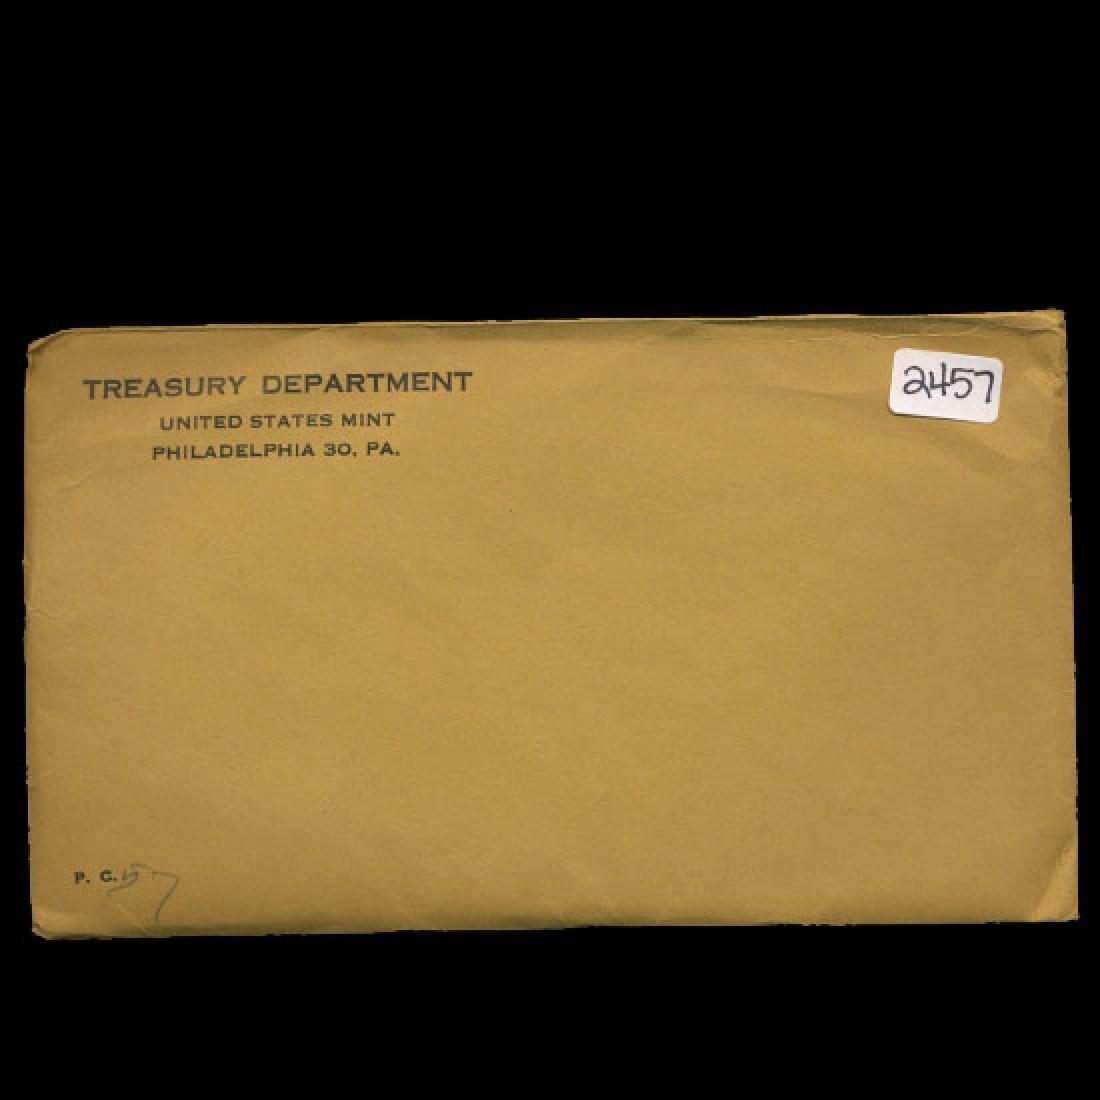 1957 Scarce Unopened Envelope Proof Set